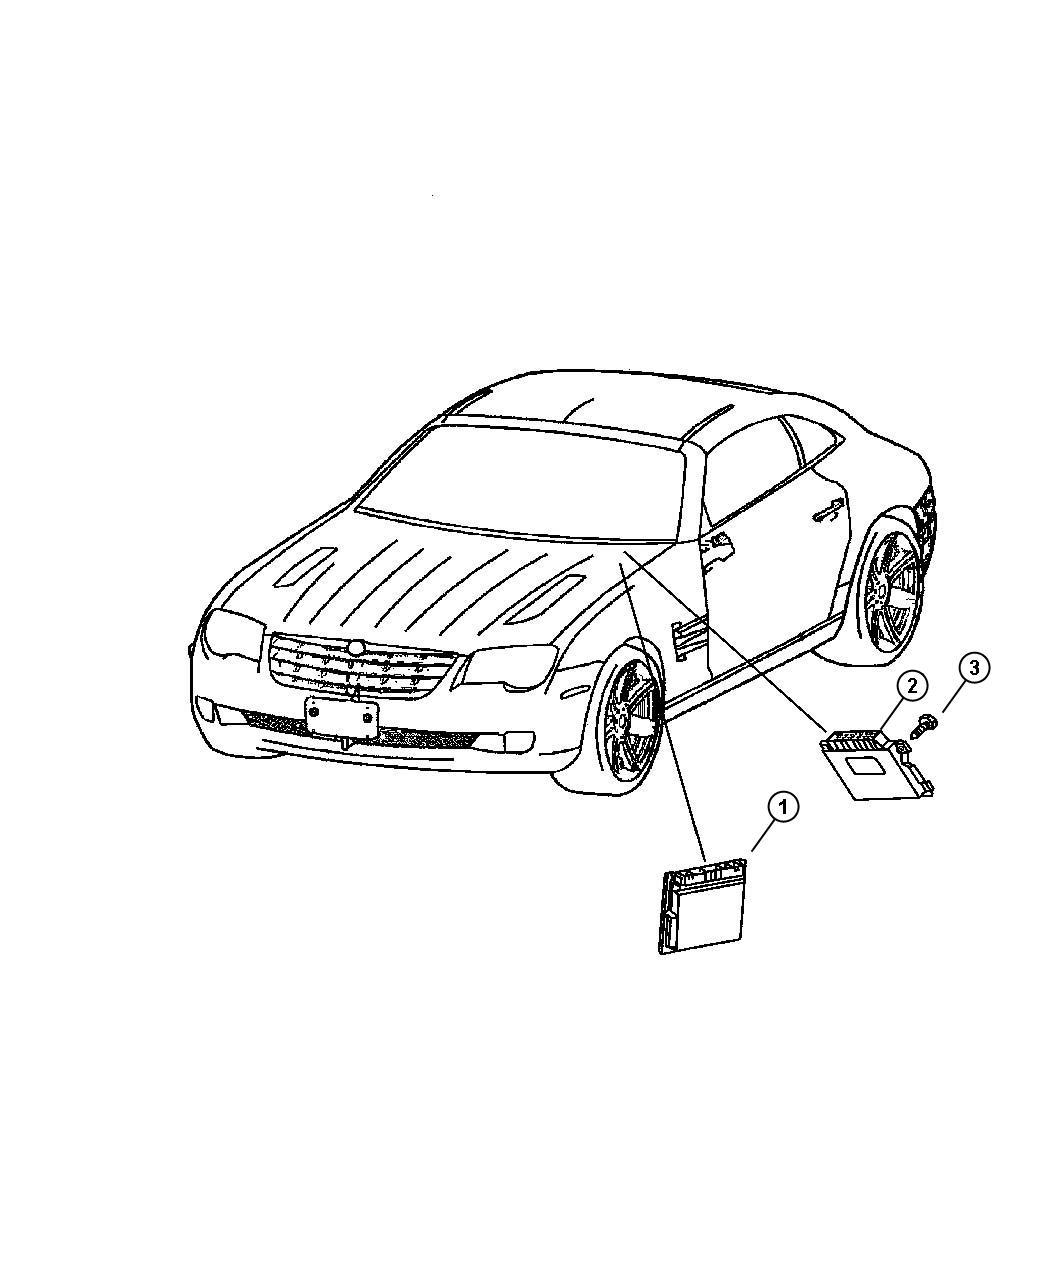 Chrysler Crossfire Module. Transmission control. [[6-speed